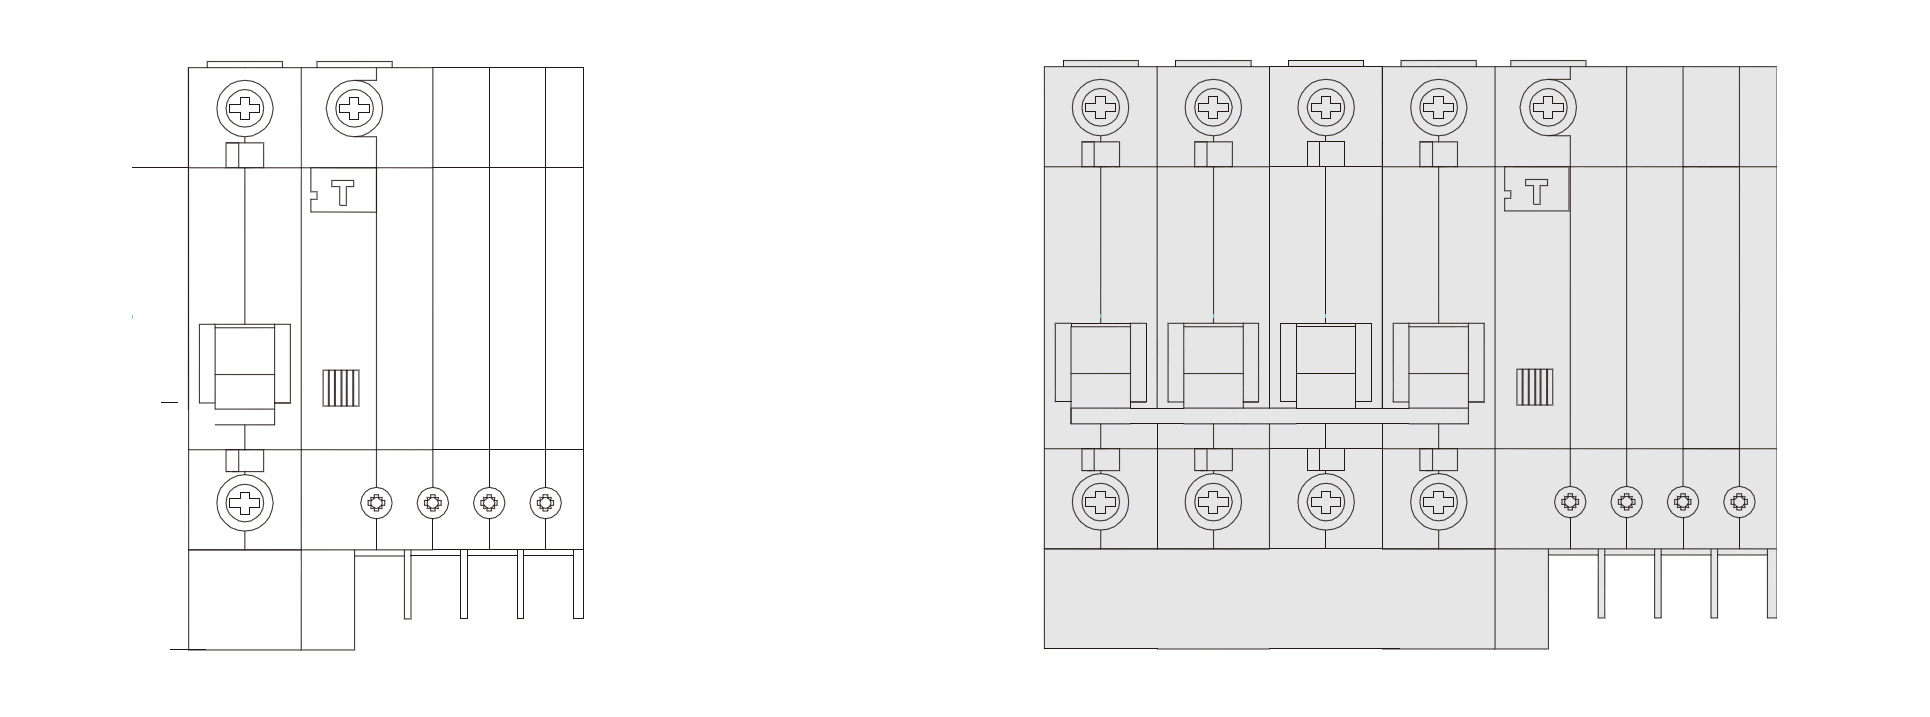 Wiring diagram. Keywords: DZ47LE-32, ELCB breaker